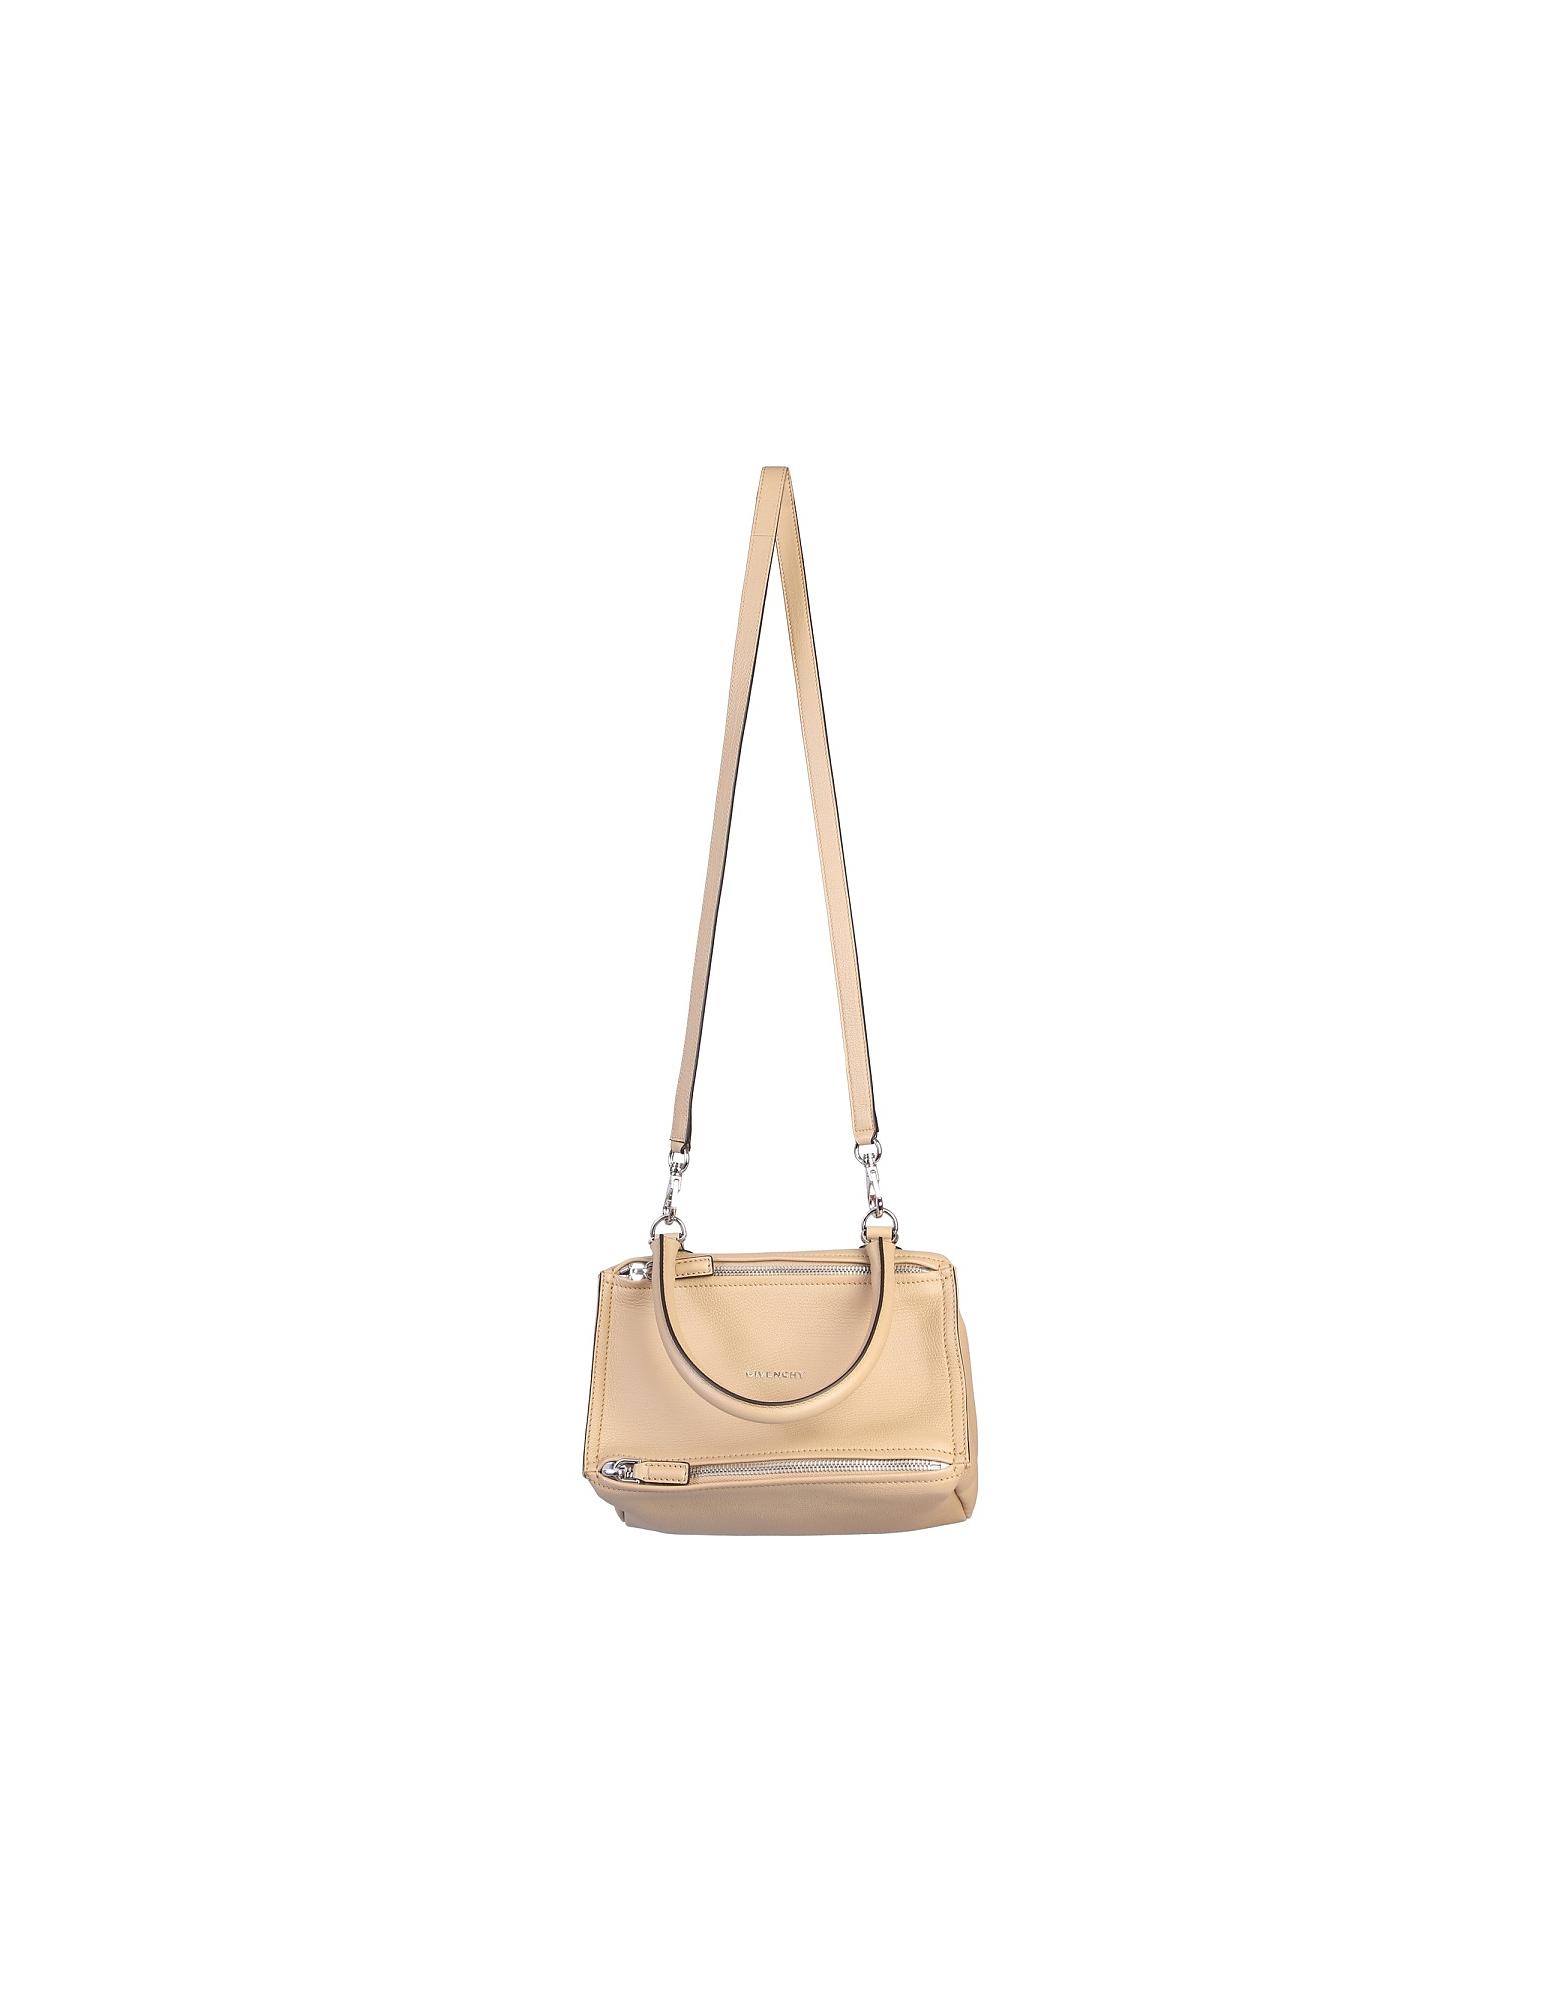 Givenchy Designer Handbags, Small Pandora Bag